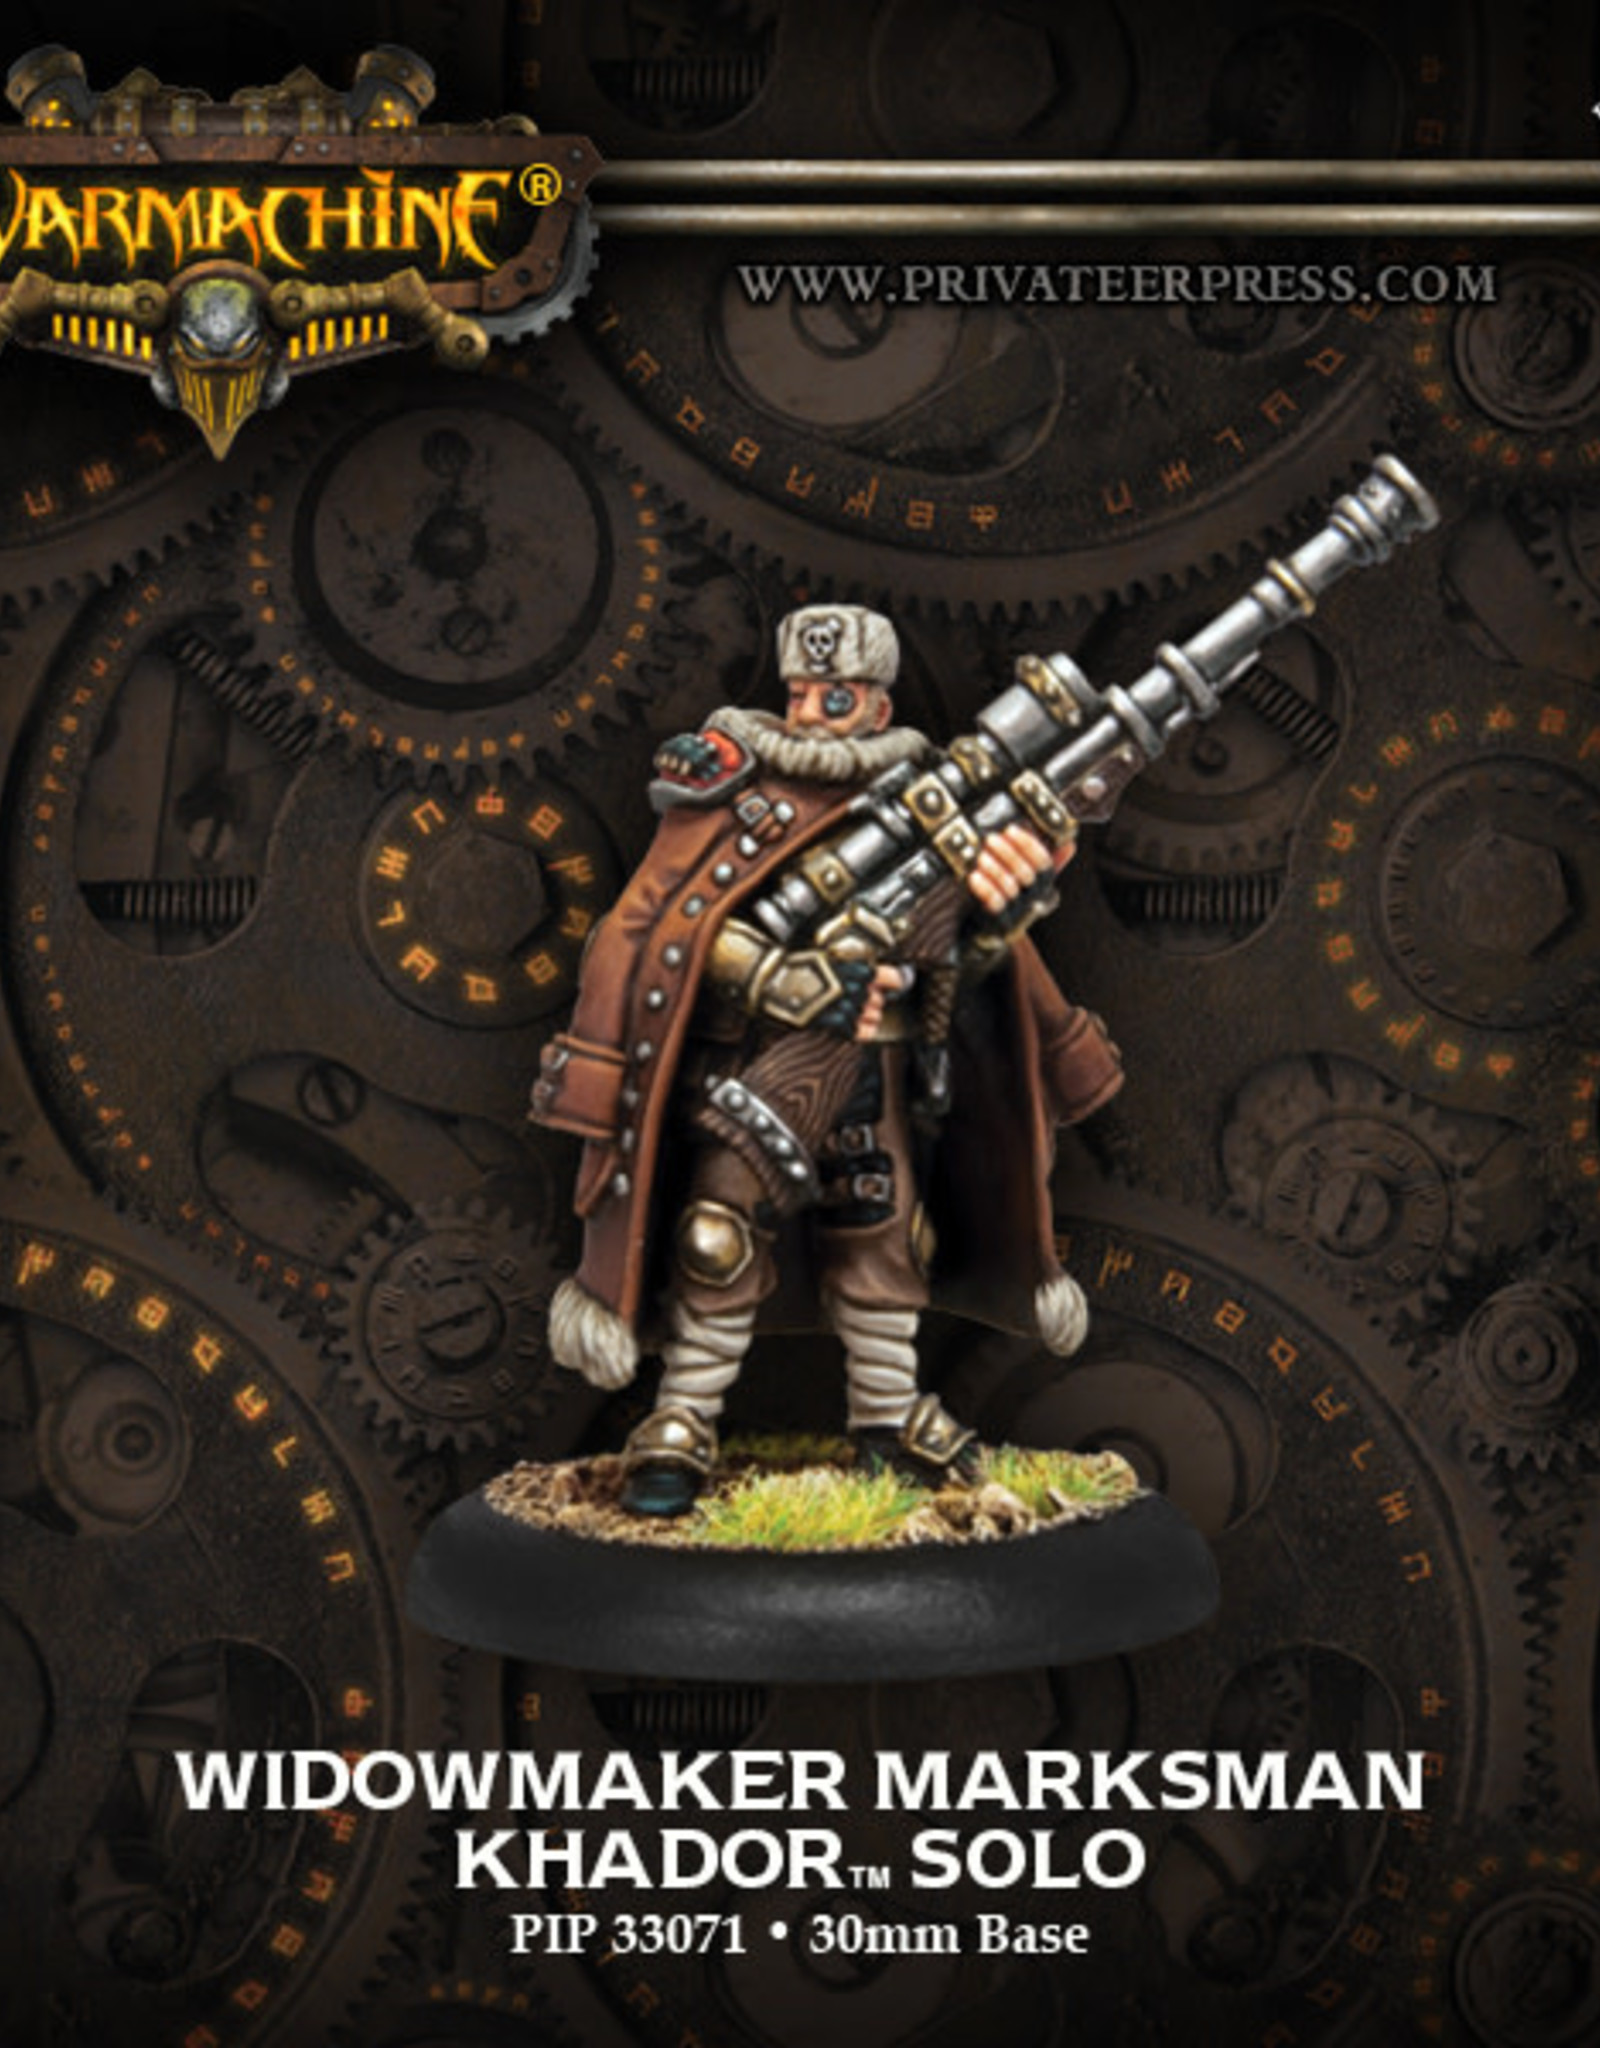 Warmachine Khador - Widowmaker Marksman